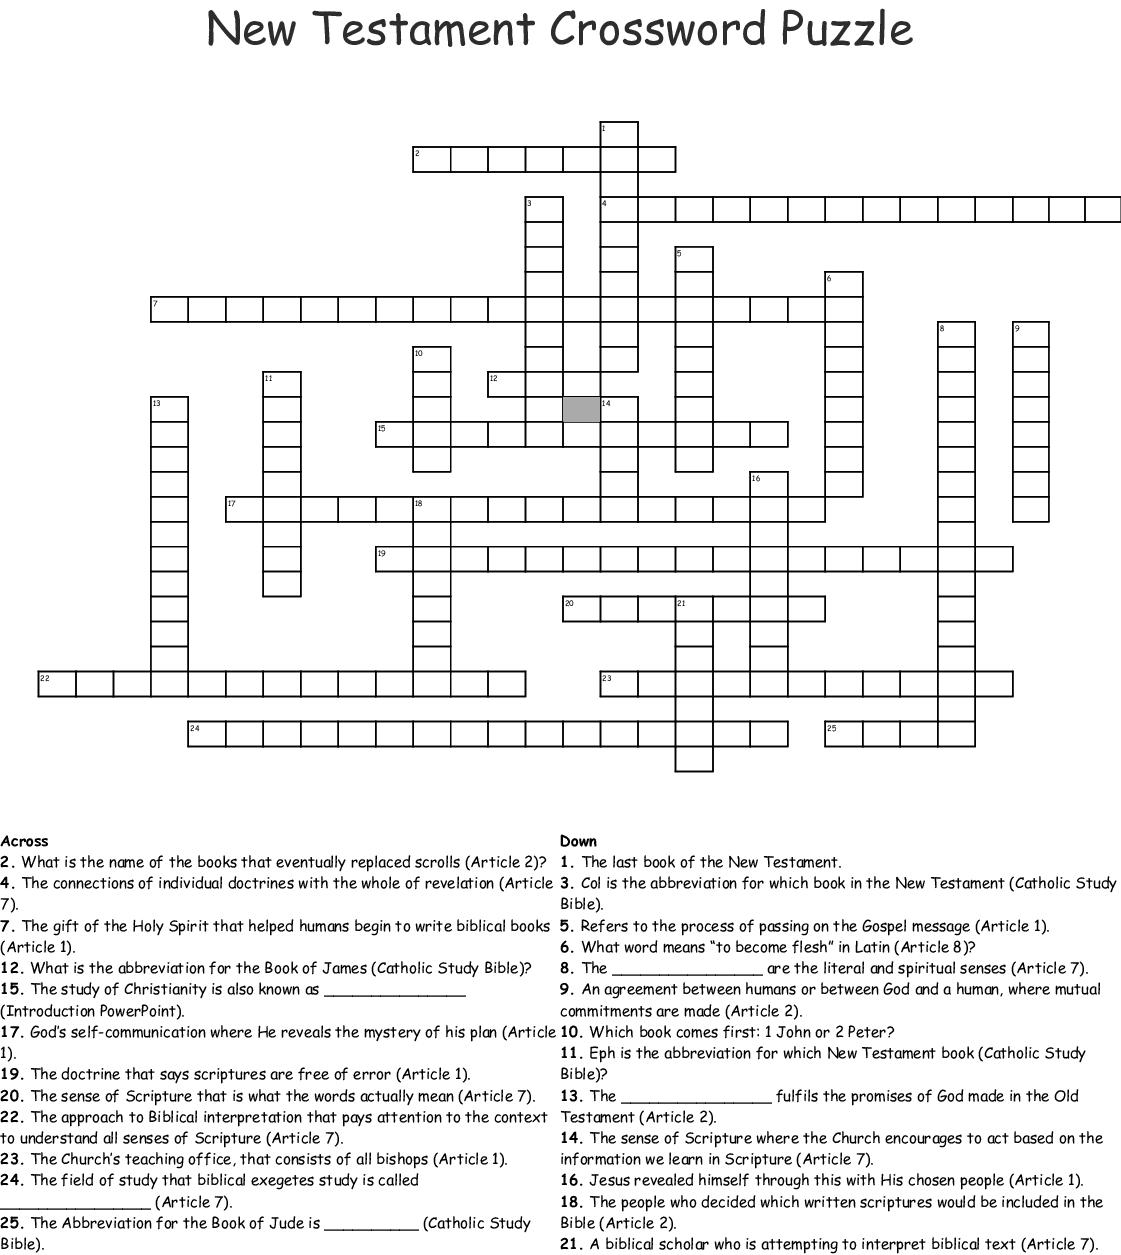 New Testament Crossword Puzzle